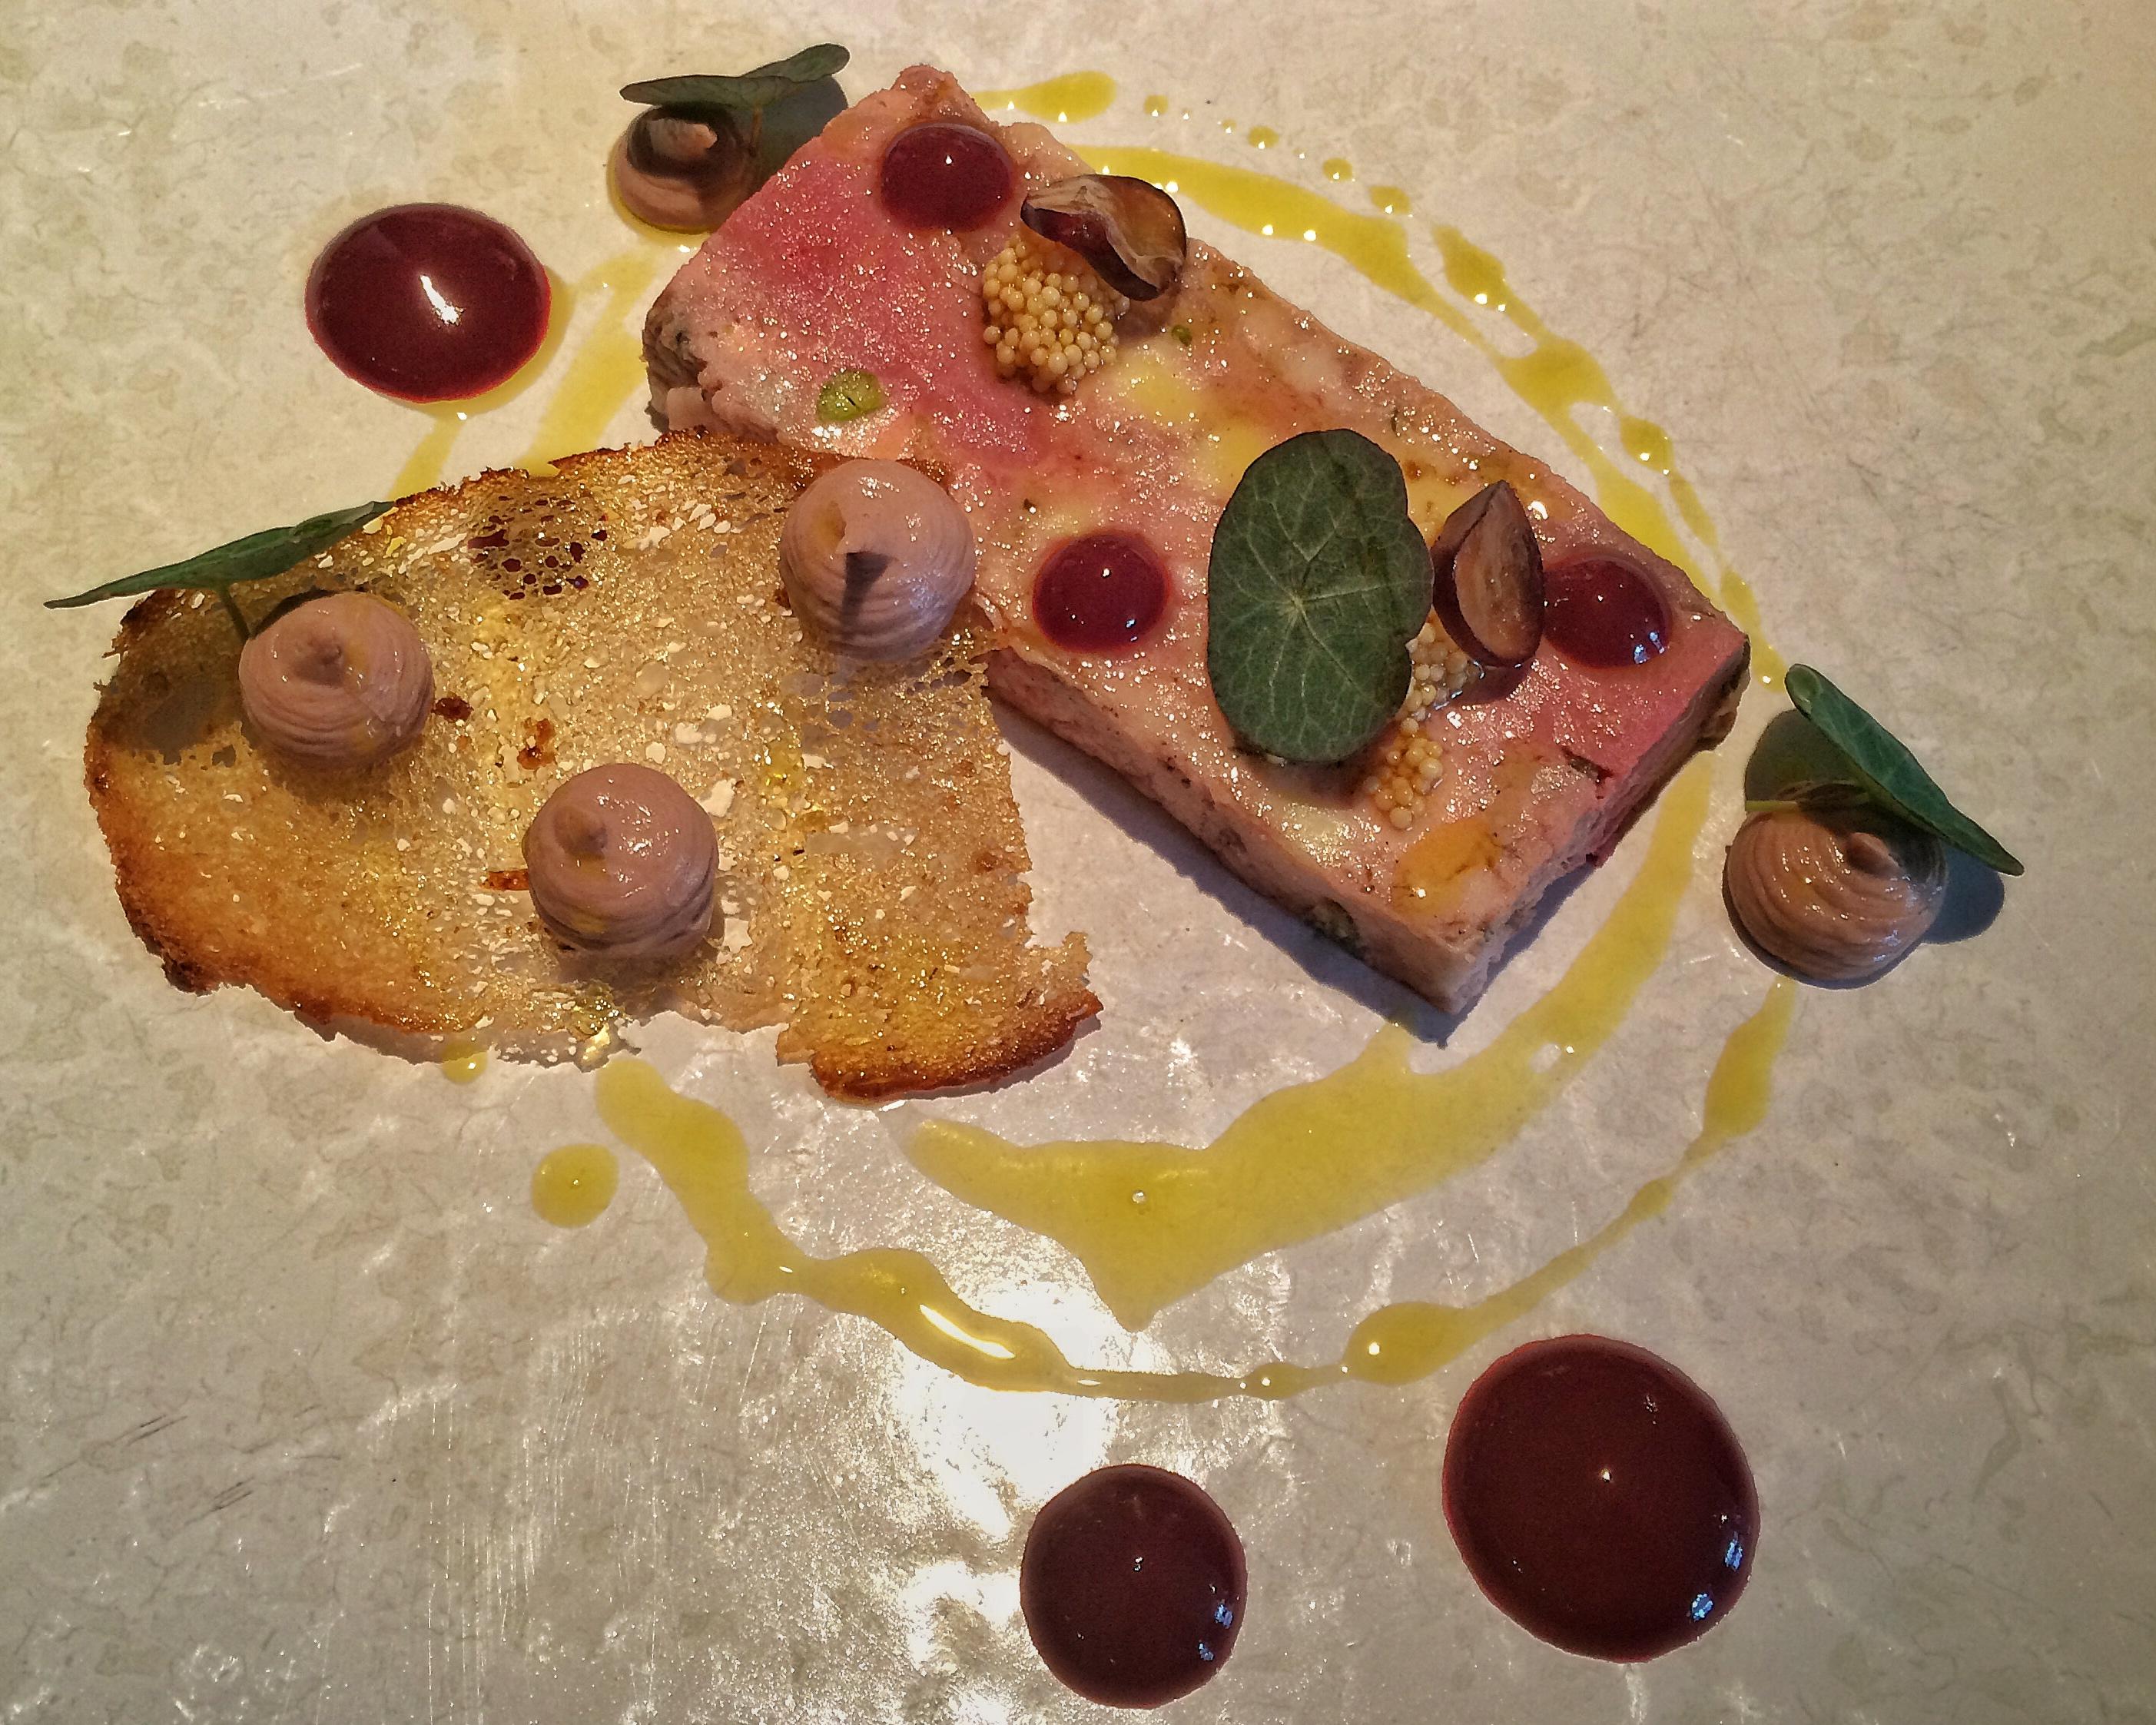 Game Terrine with Muscat Grapes & Foie Gras Parfait, Rye Bread Crouton